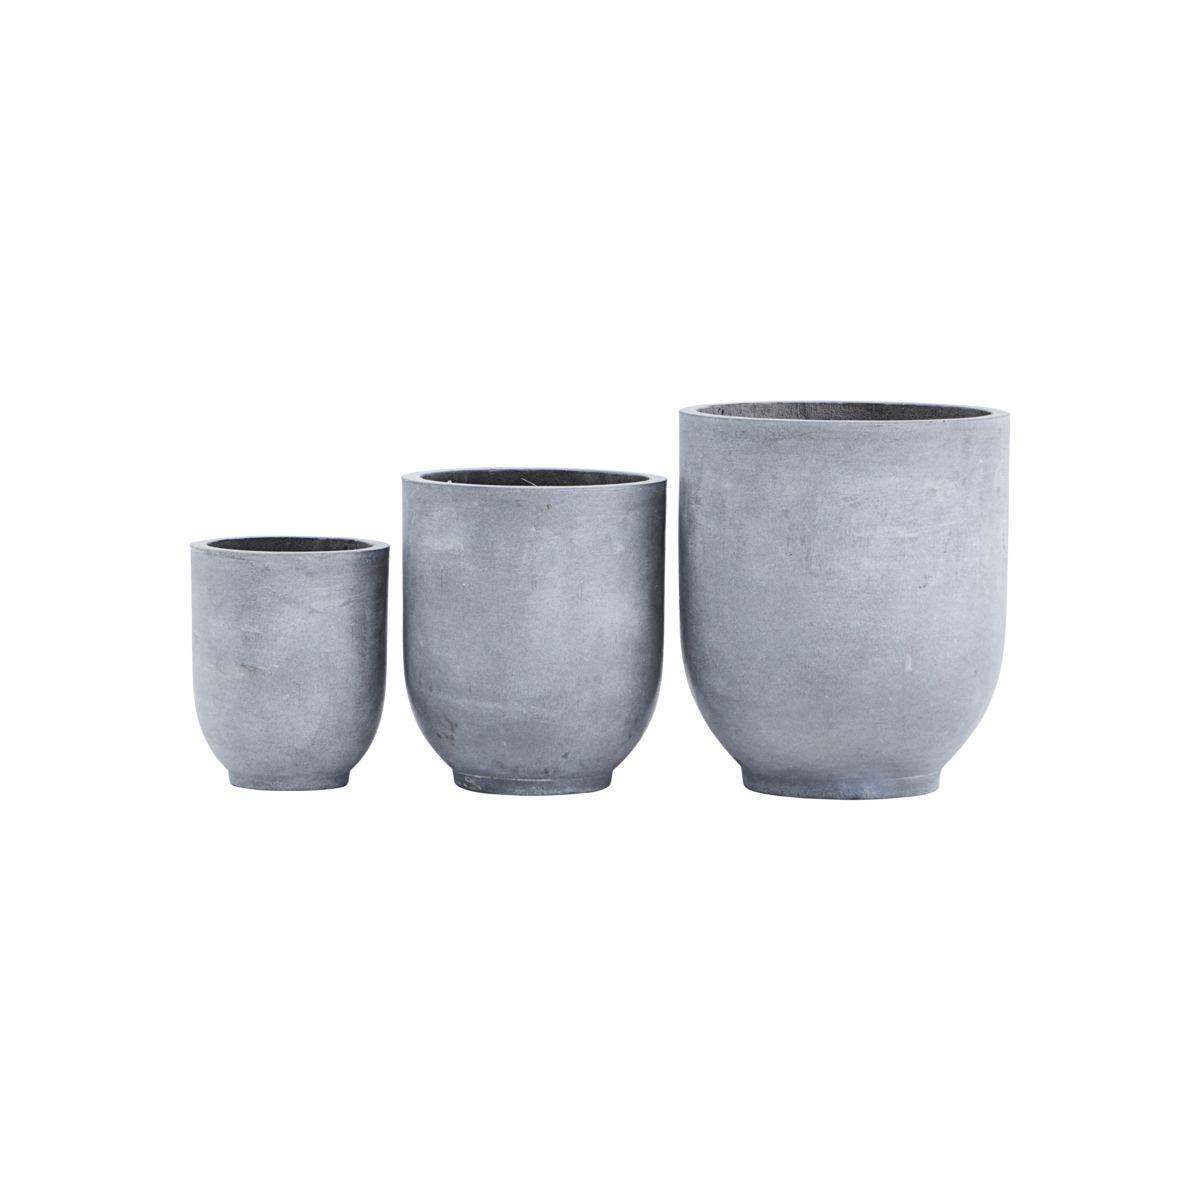 House Doctor - Gard Flowerpot Set of 3 - Grey (LY0101)